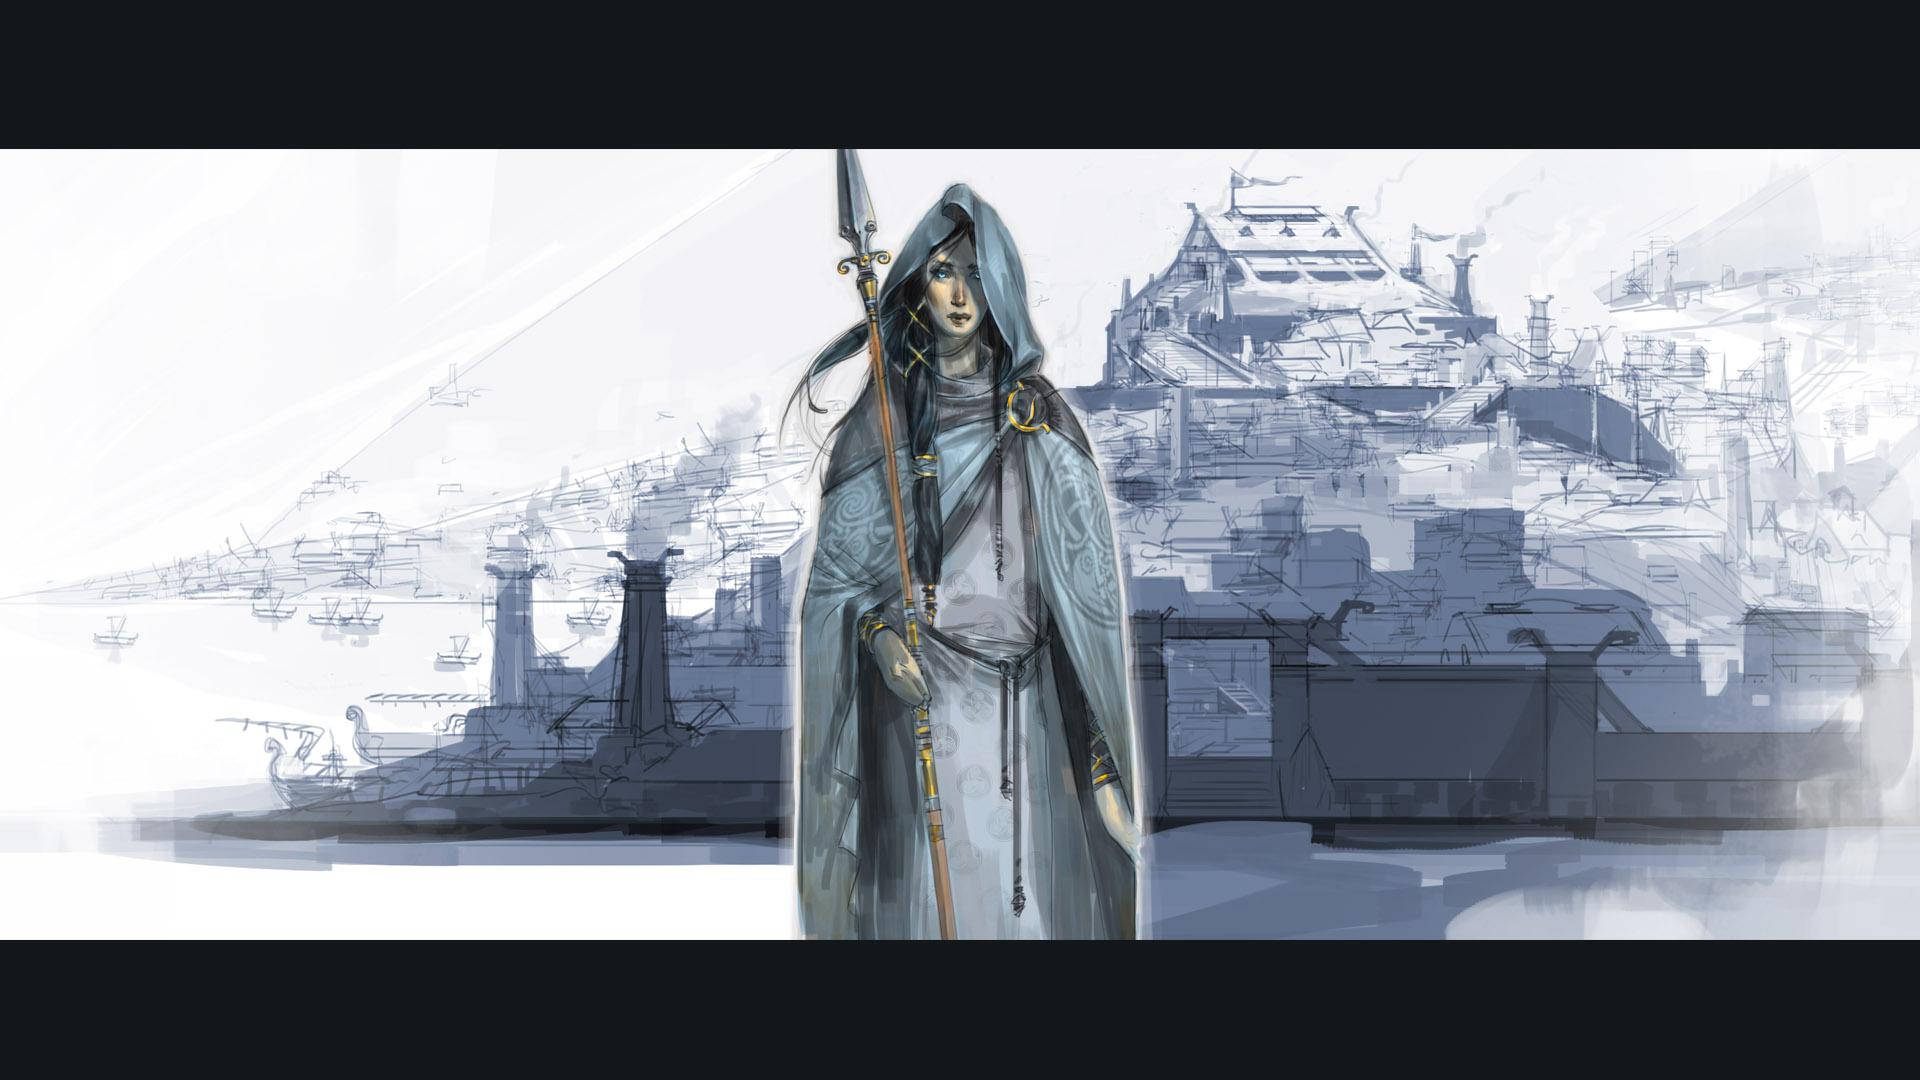 concept art from the video game The Banner Saga by Arnie Jorgensen 1920x1080